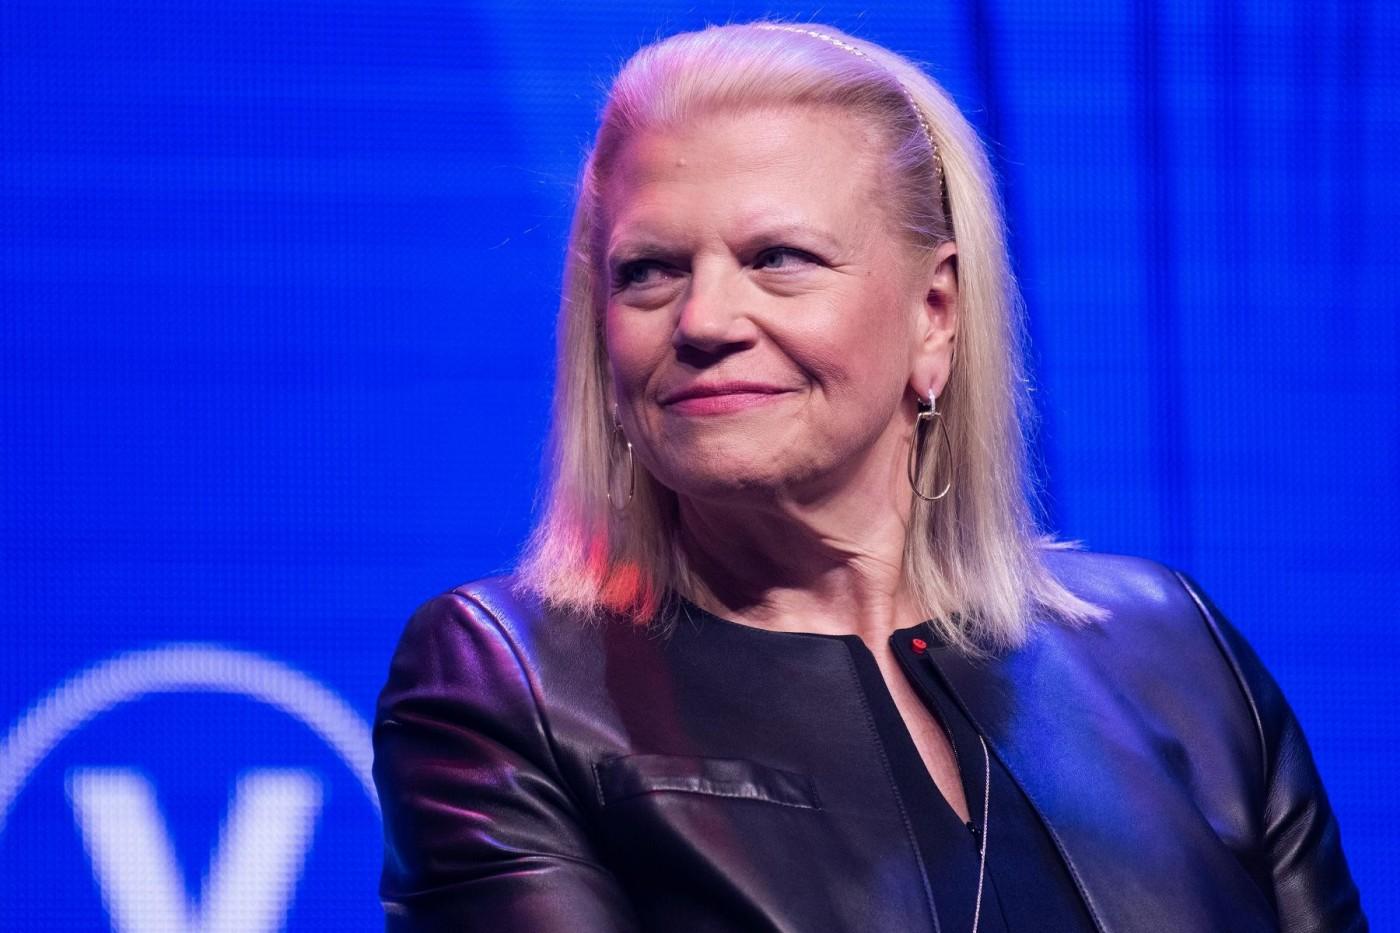 IBM羅密提4月退休、雙首長將領航!戴上紅帽的藍色大象,能在雲端輕盈起舞嗎?